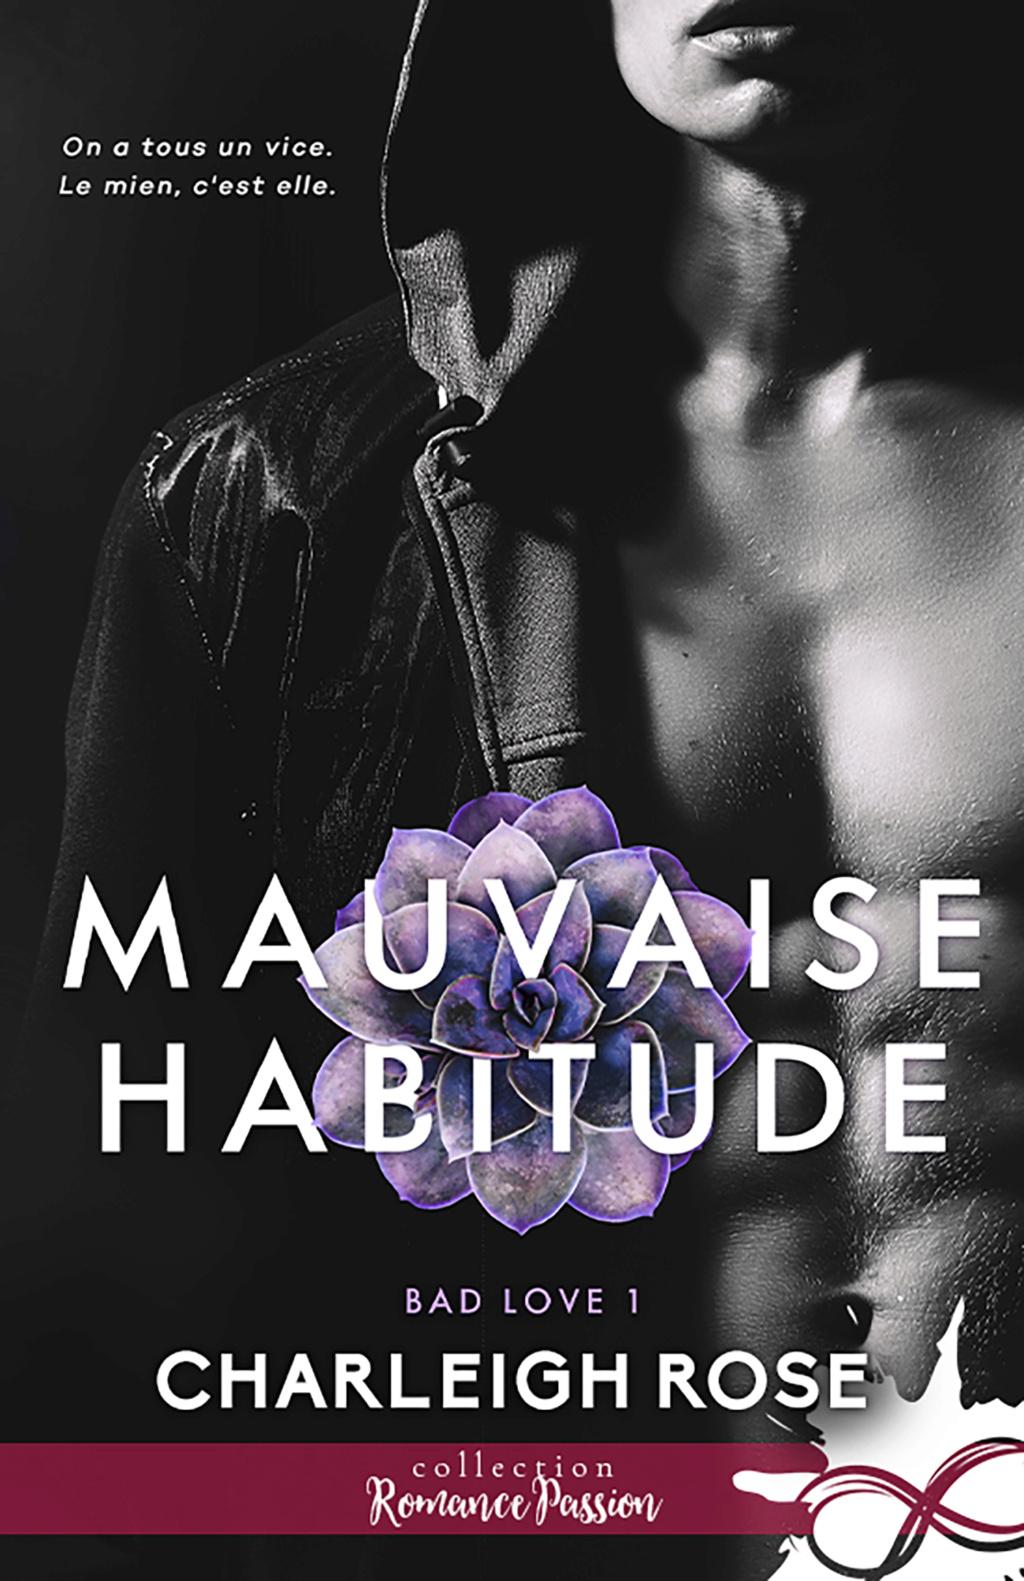 Bad love - Tome 1 : Mauvaise habitude de Charleigh Rose A22b4310